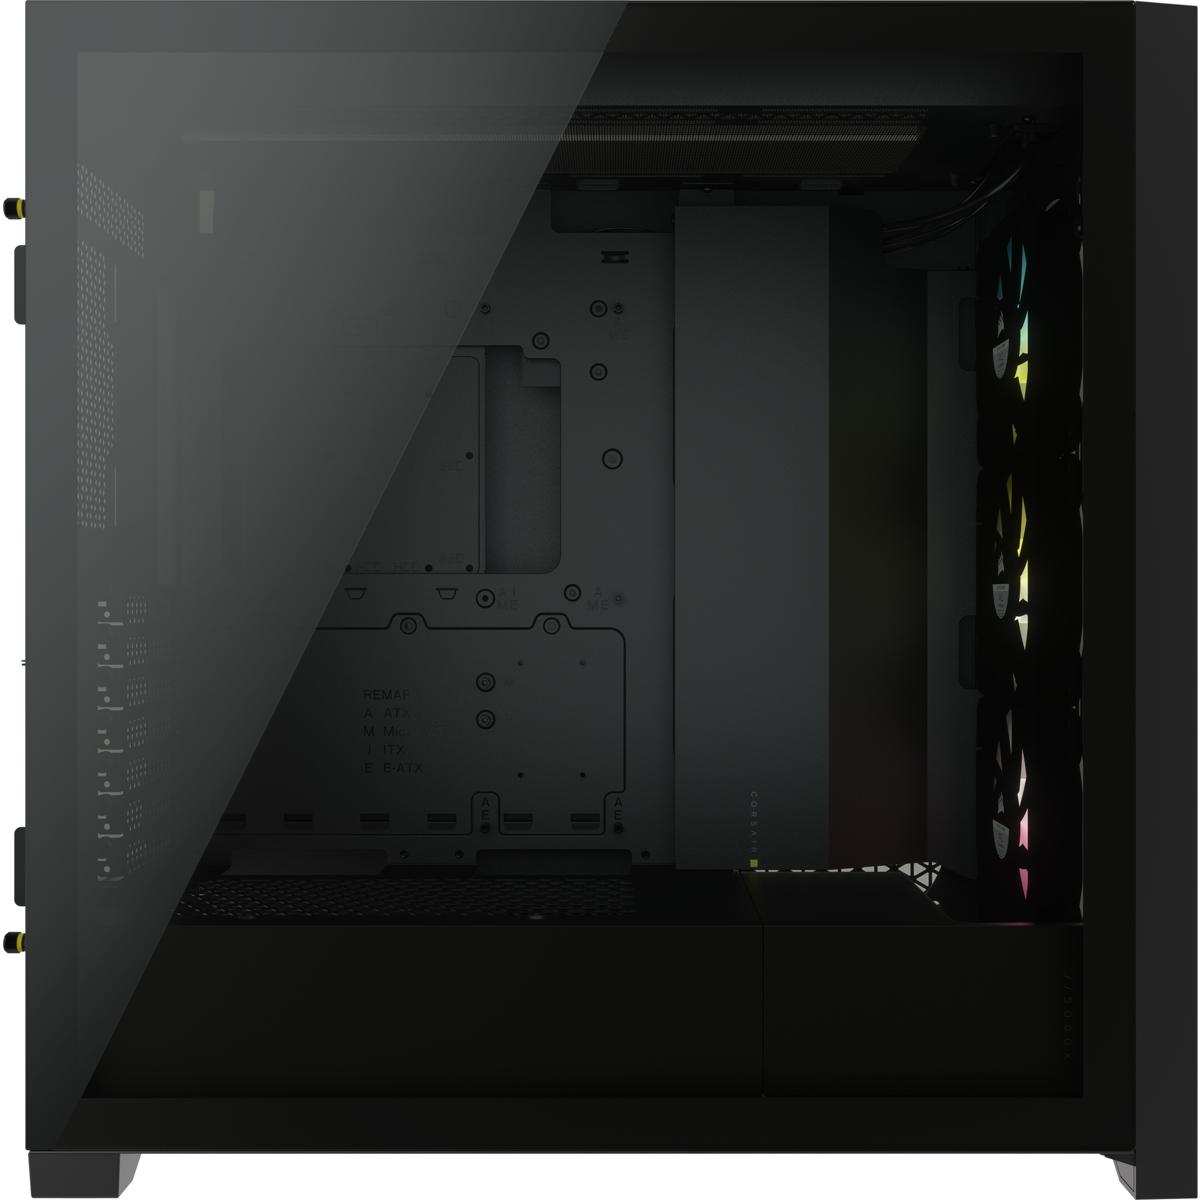 base-5000x-gallery-5000x-rgb-black-12